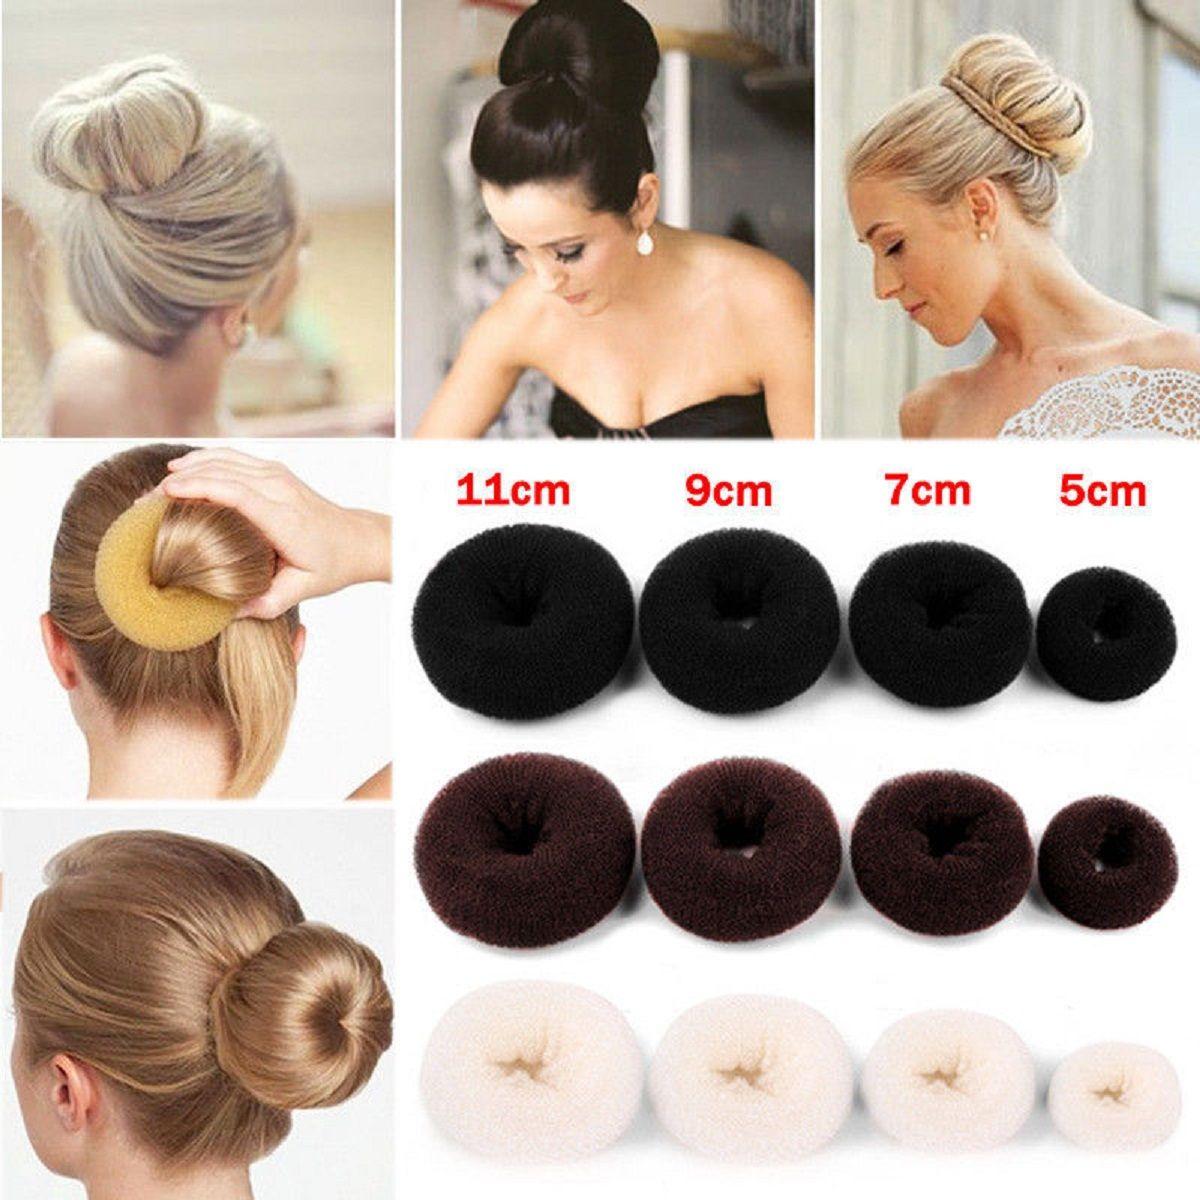 Foam Sponge Hair Accessories Donuts Style Hair Ring Bun Shape Hair Styler Ad Accessories Ad Donuts Hair Hair Bun Maker Hair Donut Hair Styler